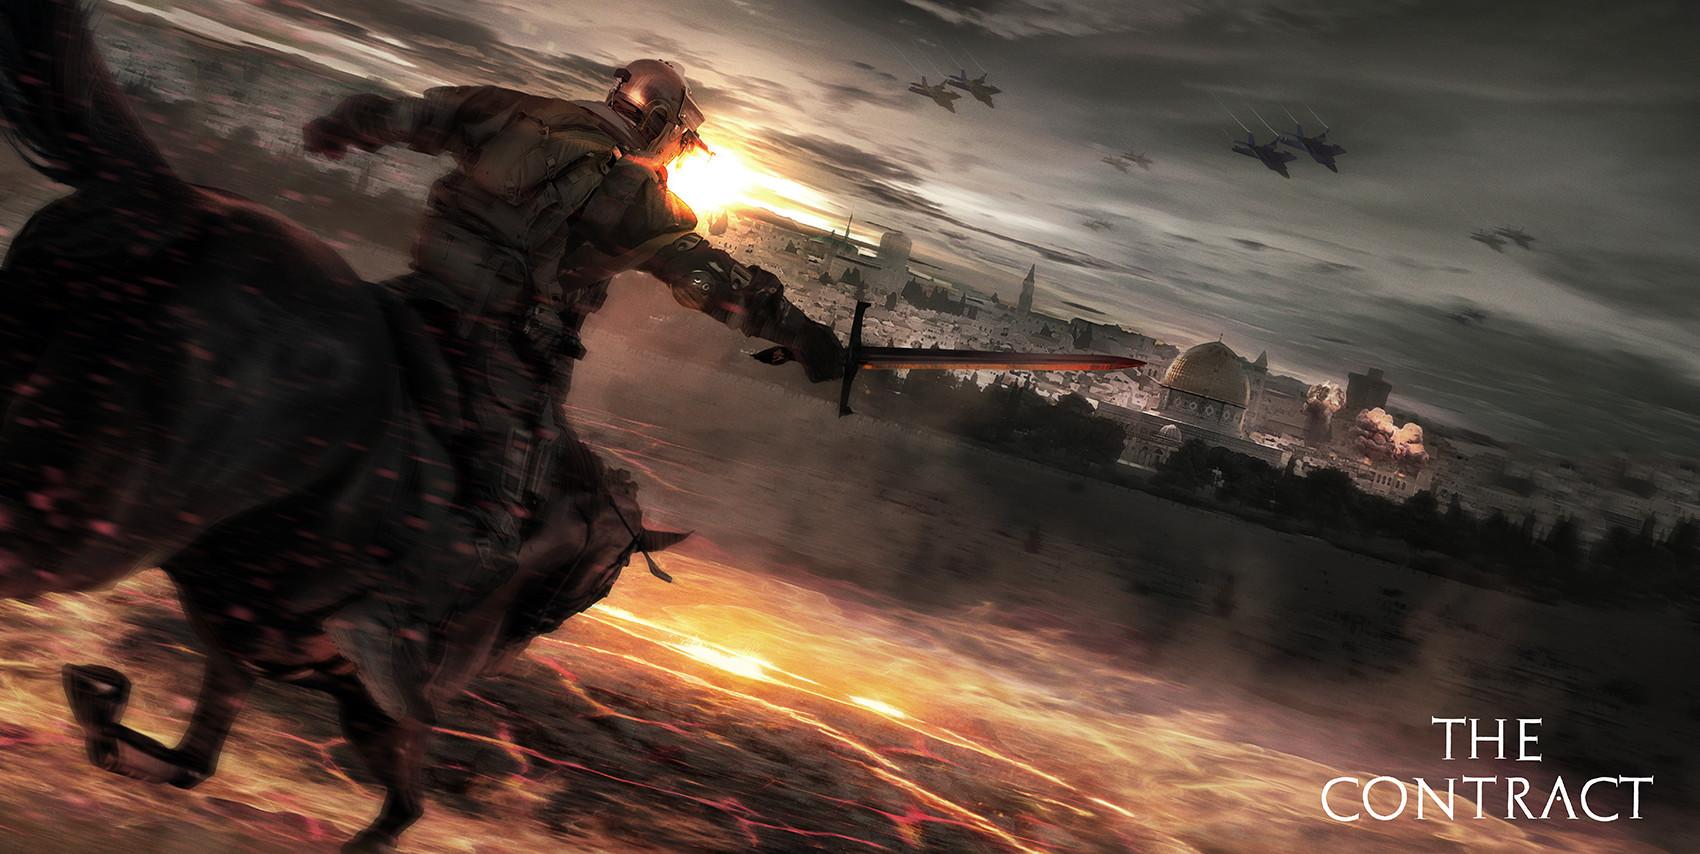 Joakim ericsson war apocalypse rider 3